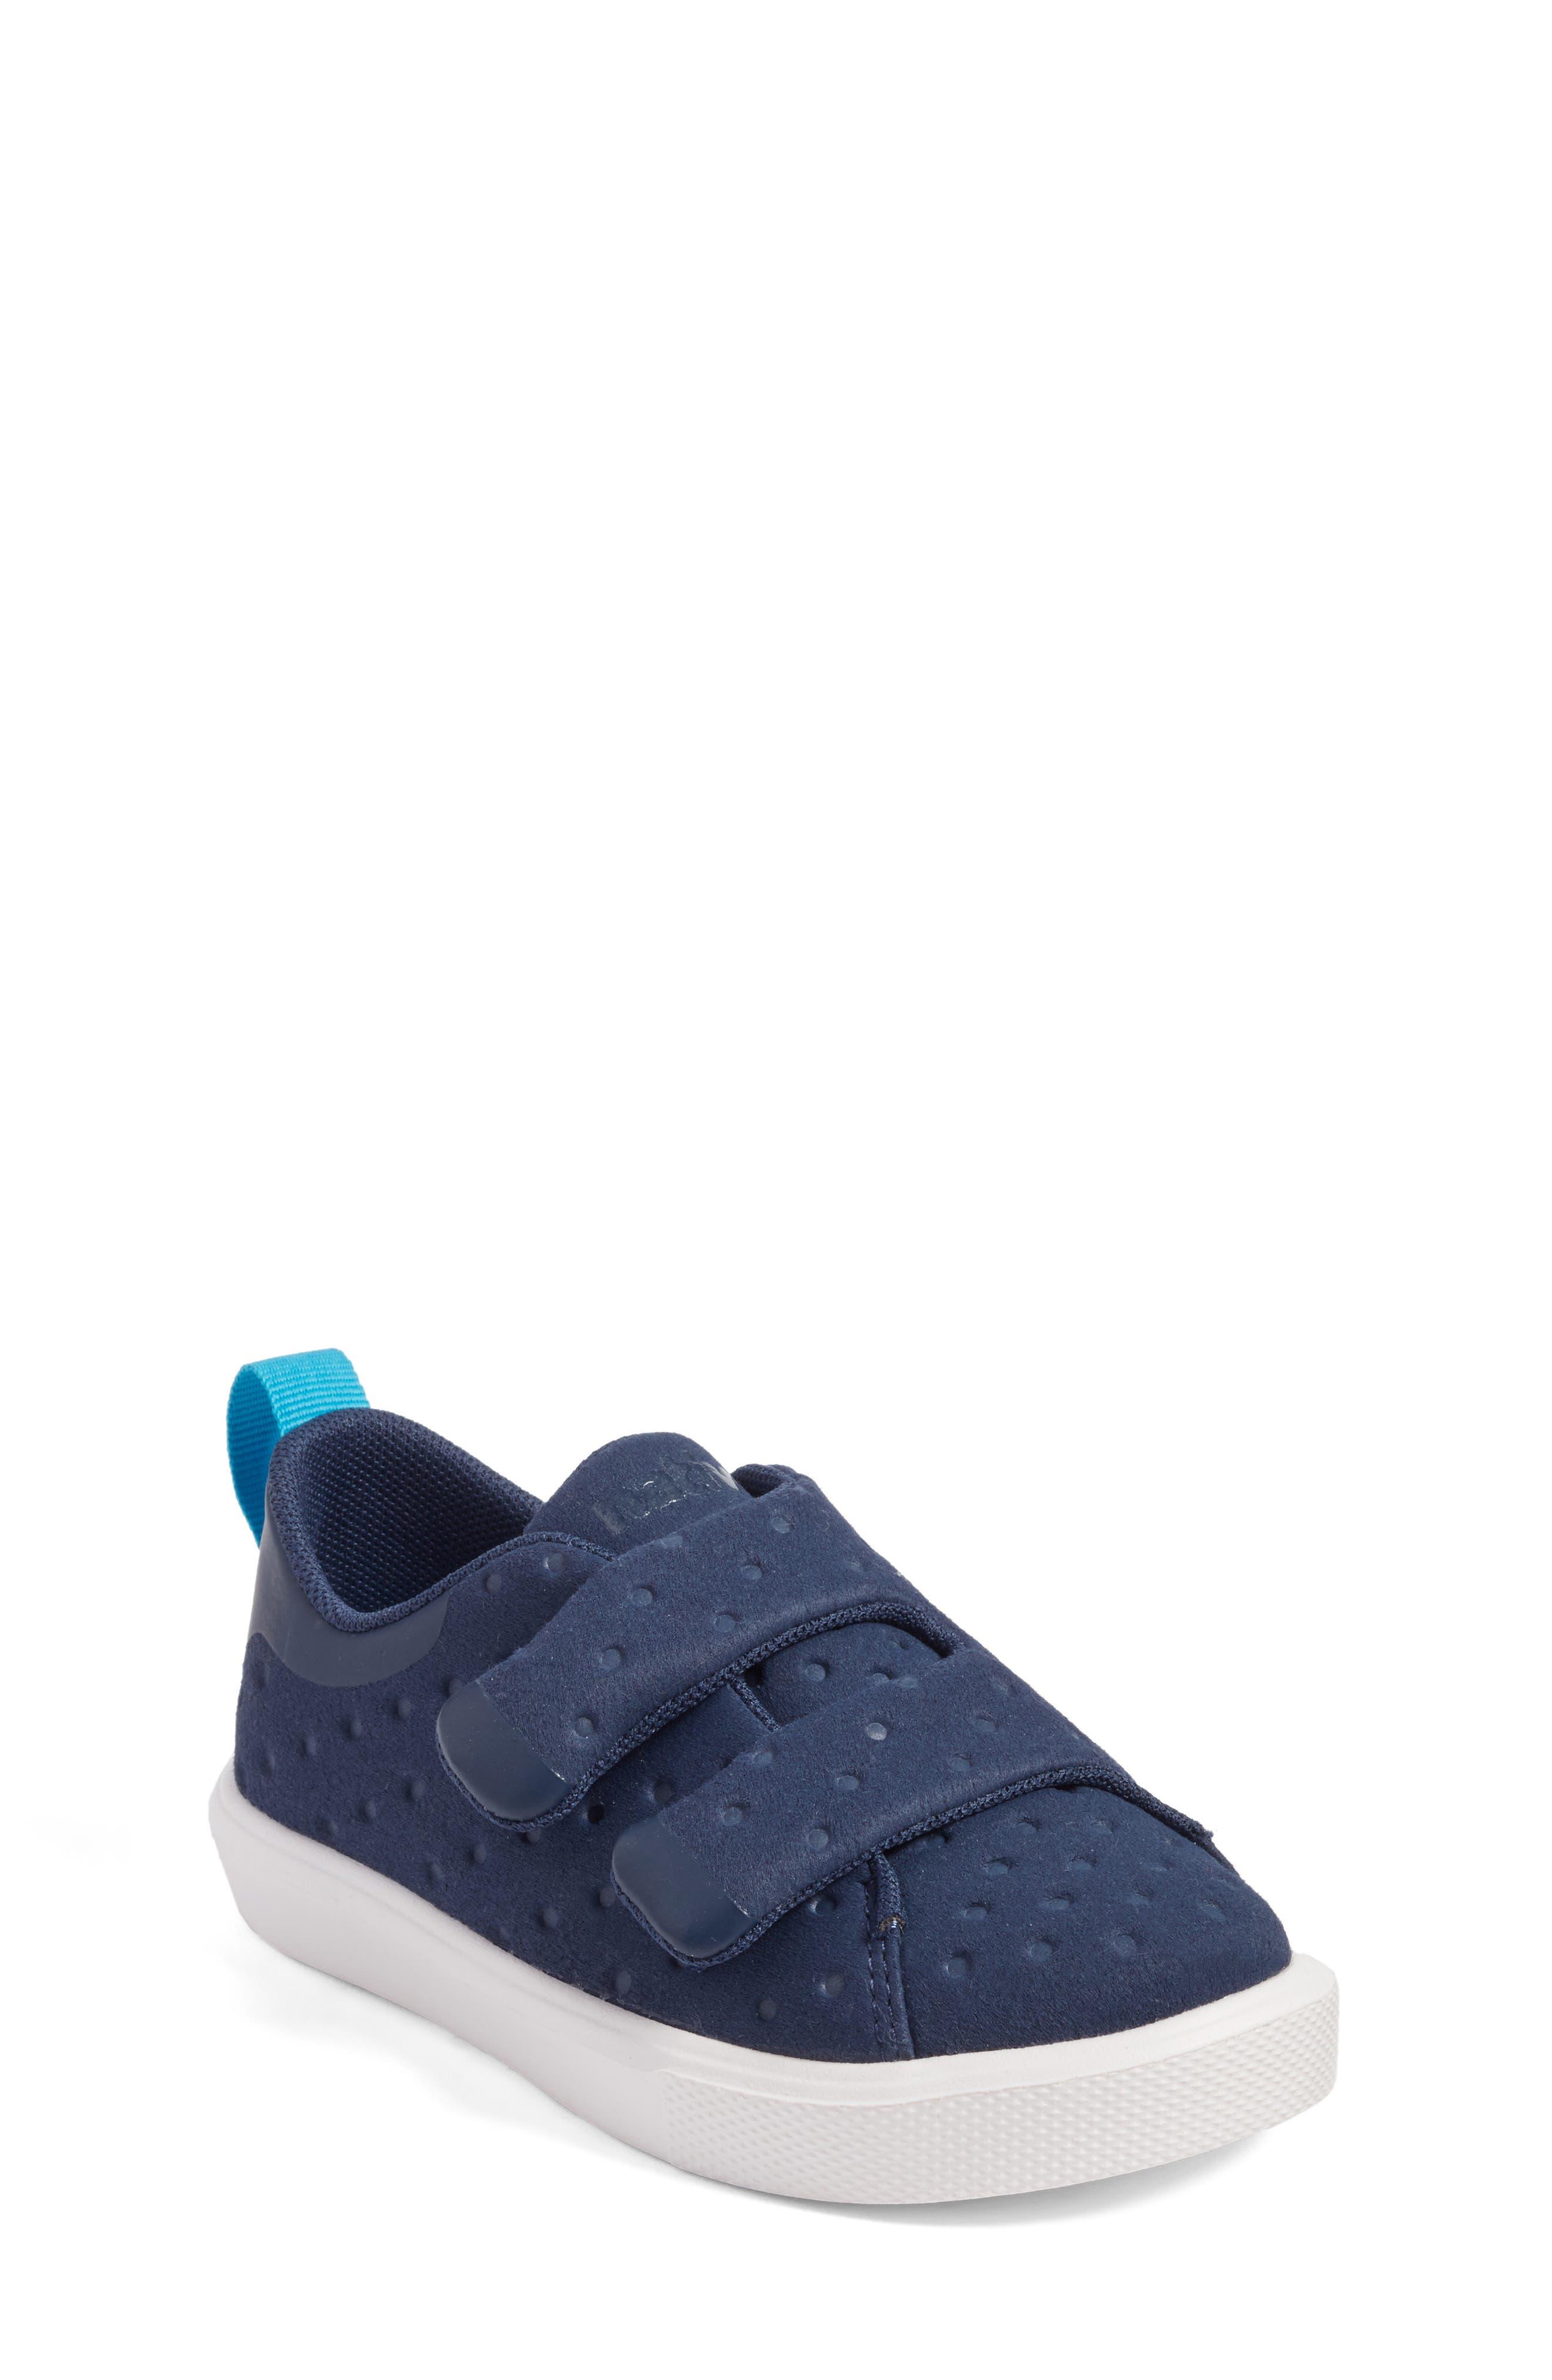 Alternate Image 1 Selected - Native Shoes Monaco Sneaker (Walker, Toddler & Little Kid)